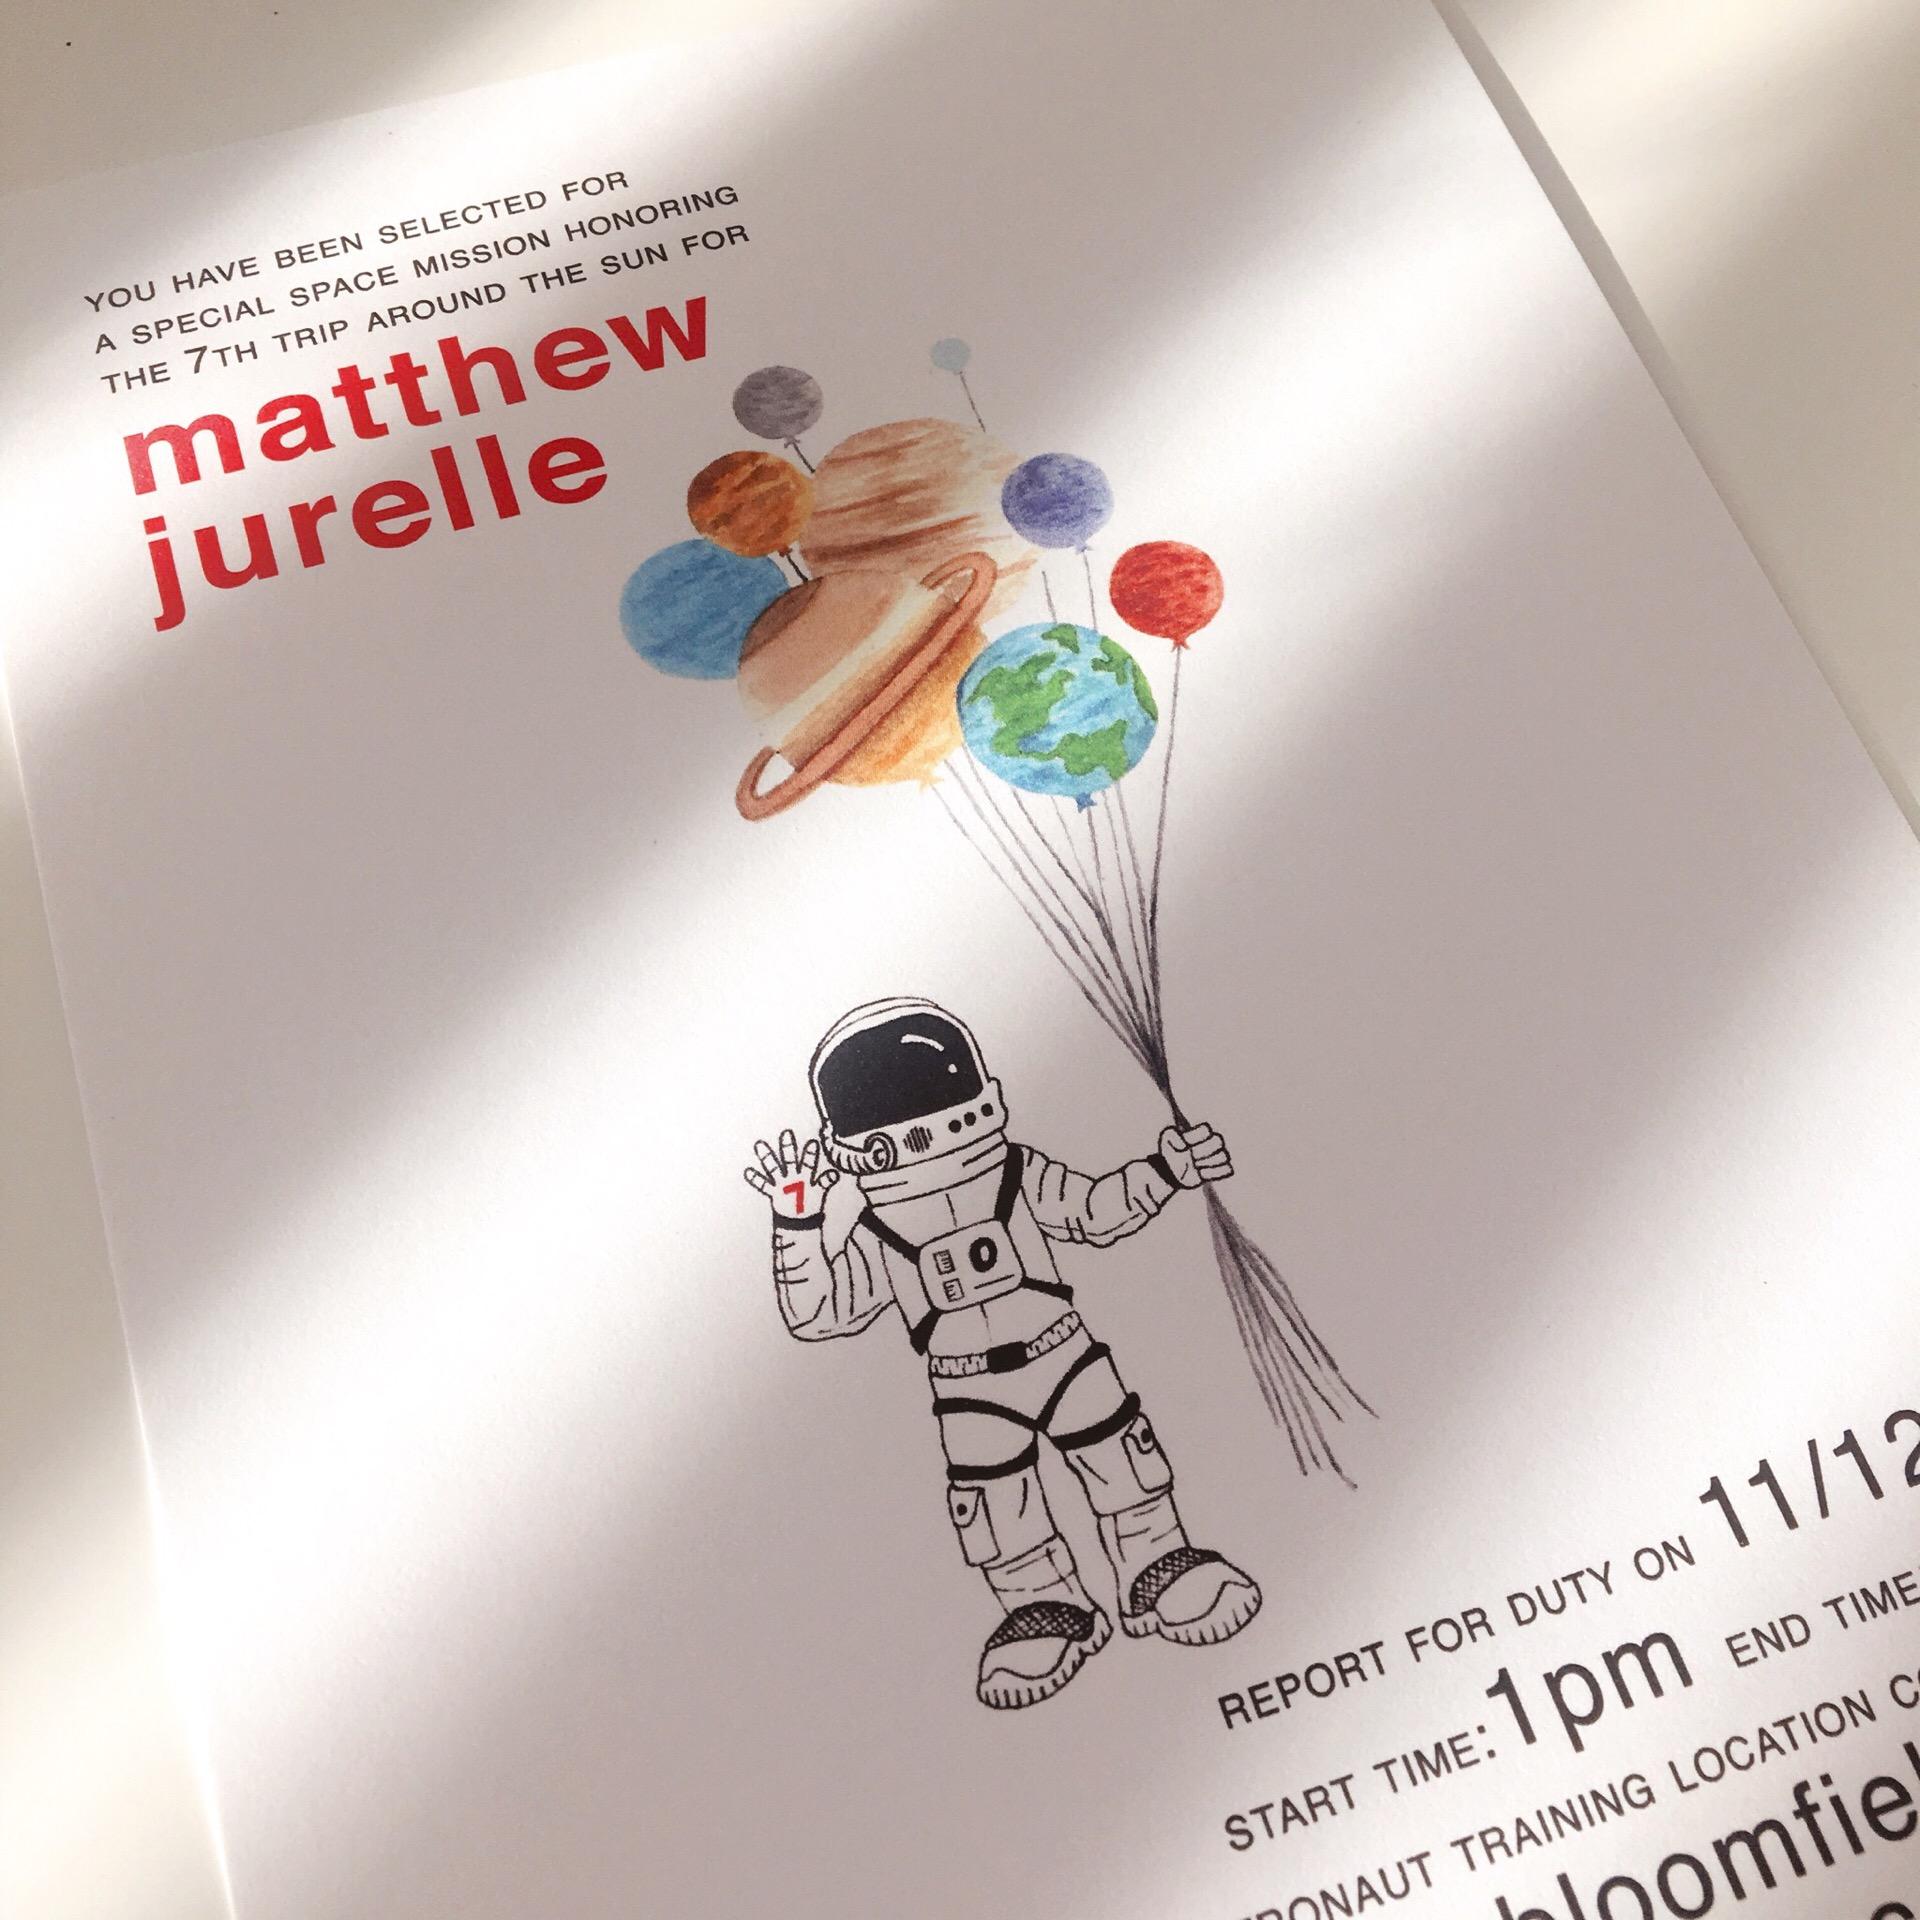 Solar System Astronaut Birthday Invitation.JPG